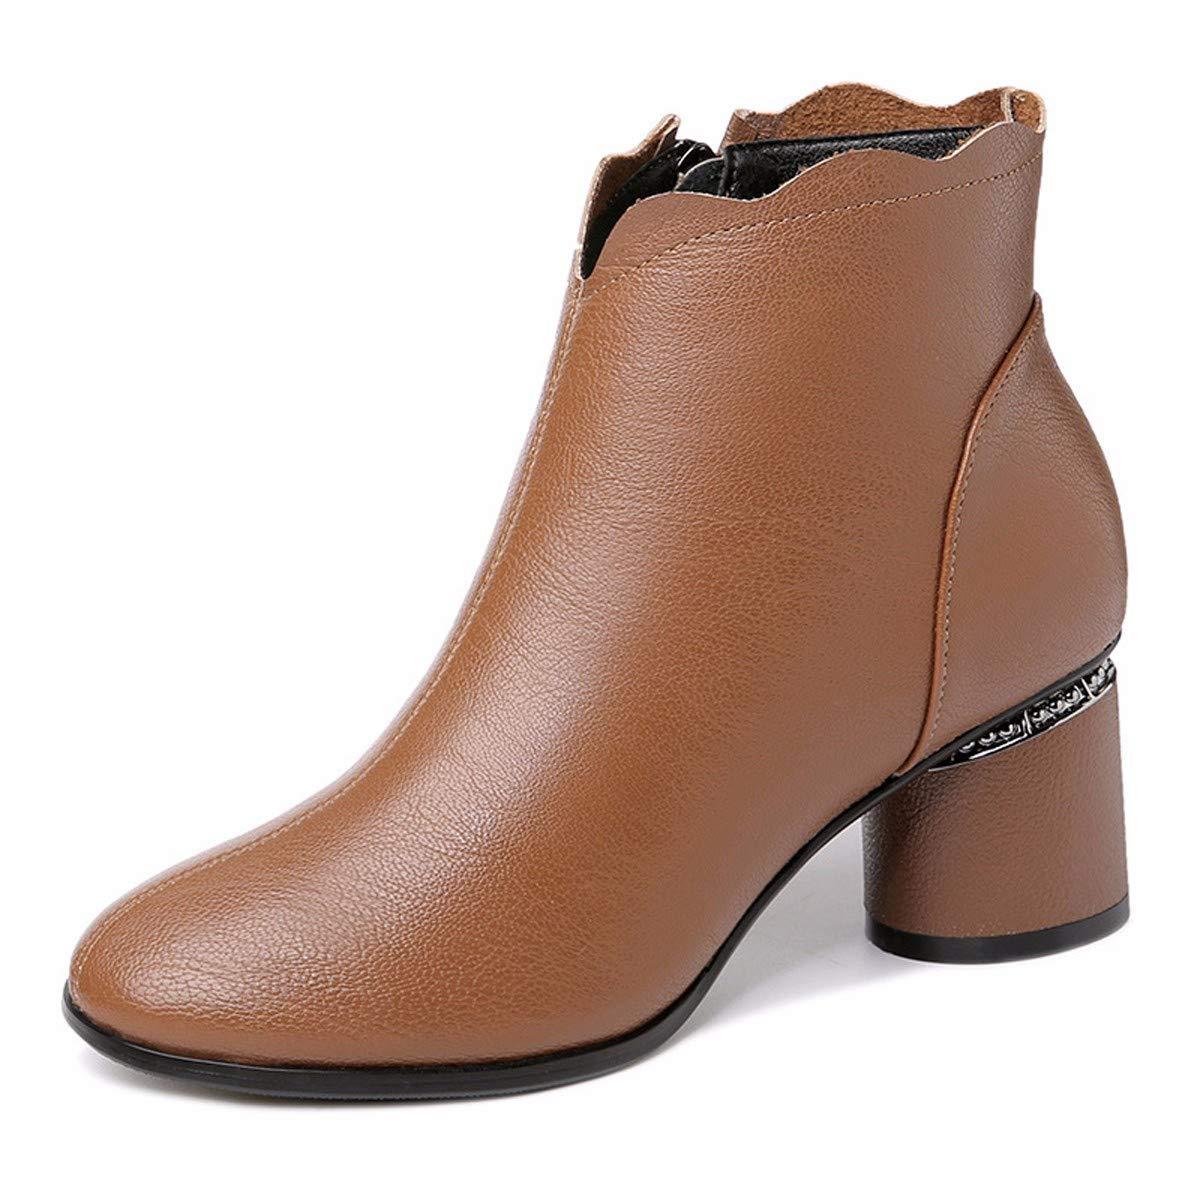 KPHY Damenschuhe Meine Damen Mode - Stiefel Kurze Stiefeln Dicken Absätzen 6 cm High Heels SAMT Runde Kopf Reißverschlüsse.